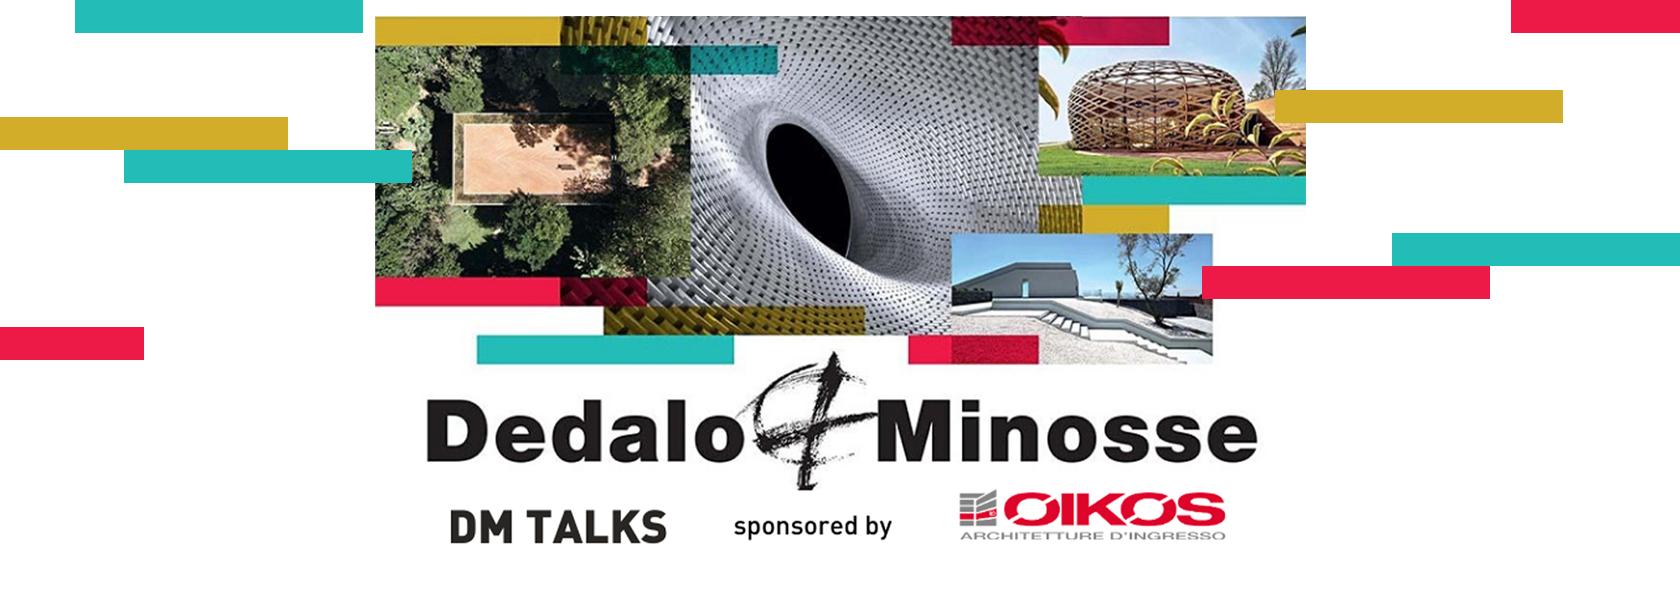 Premio Internazionale Dedalo Minosse - Oikos